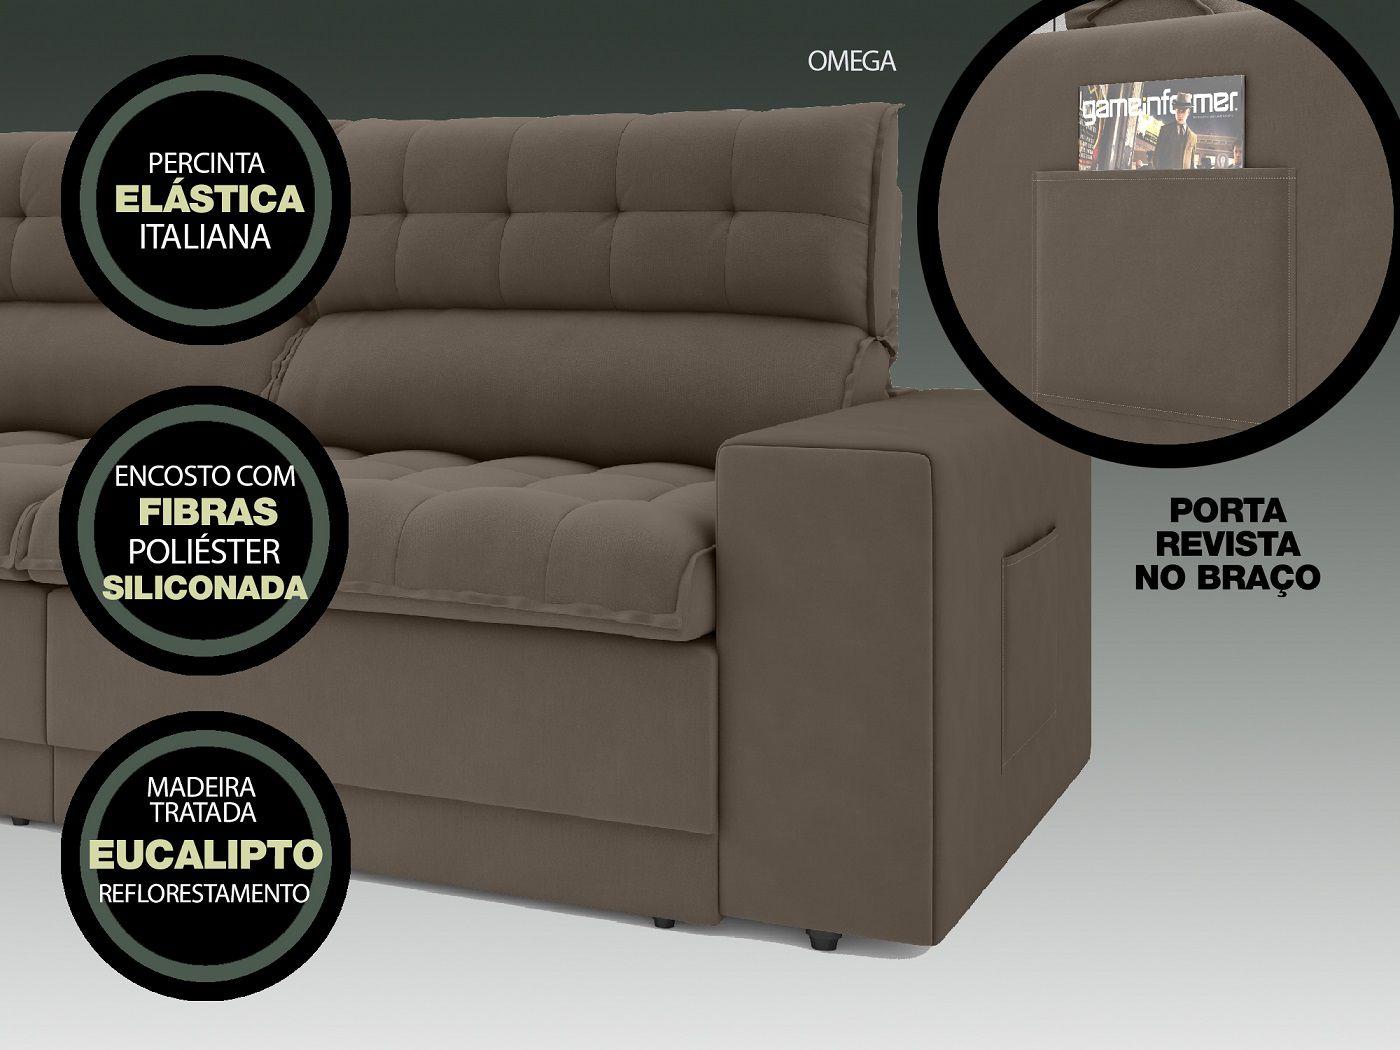 Sofá Omega 2,30m Assento Retrátil e Reclinável Velosuede Marrom - NETSOFAS  - NETSOFÁS